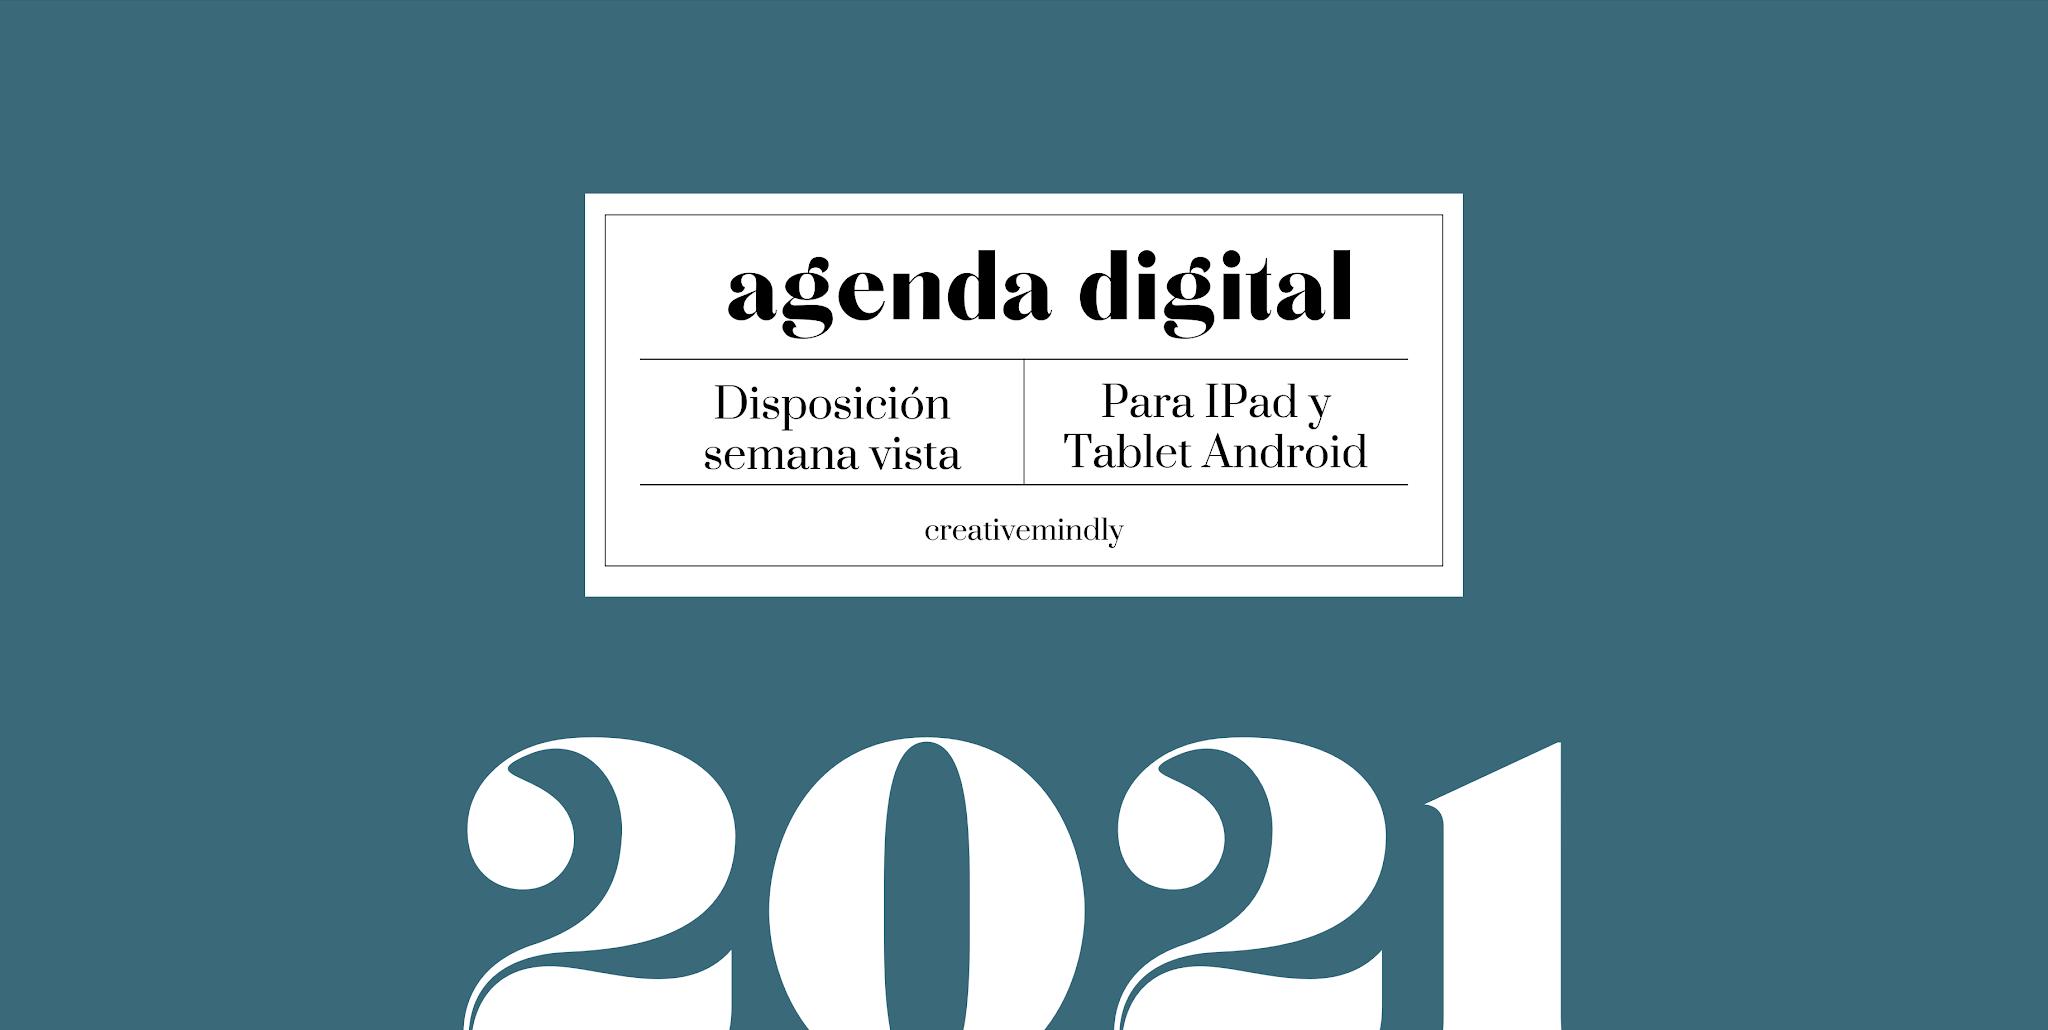 Agenda digital ipad bonita 2021